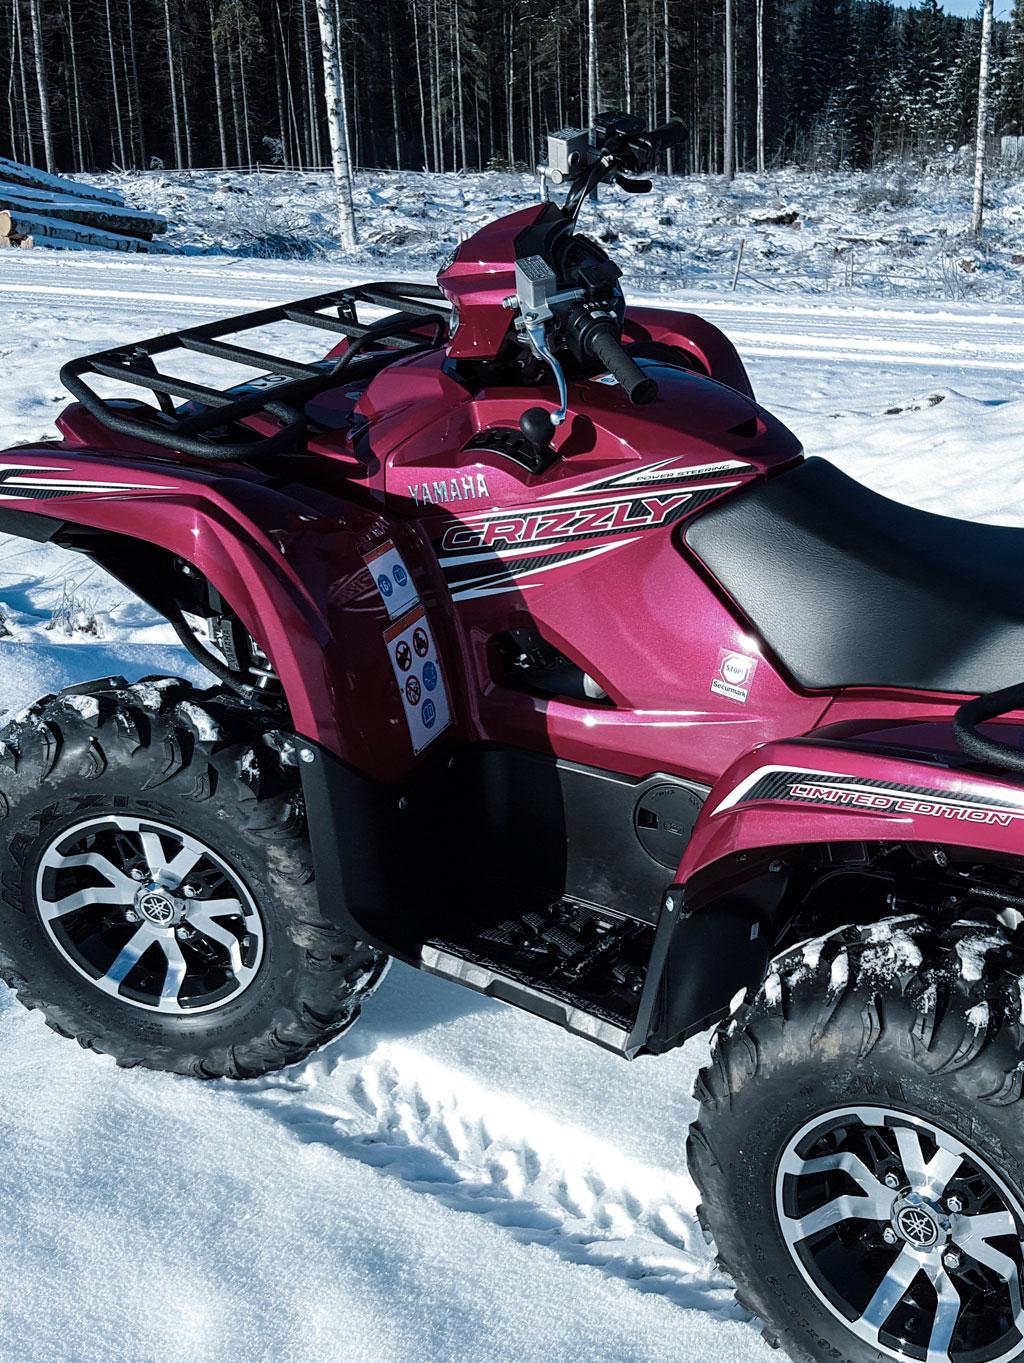 ATV_in_snow2_vip_staende